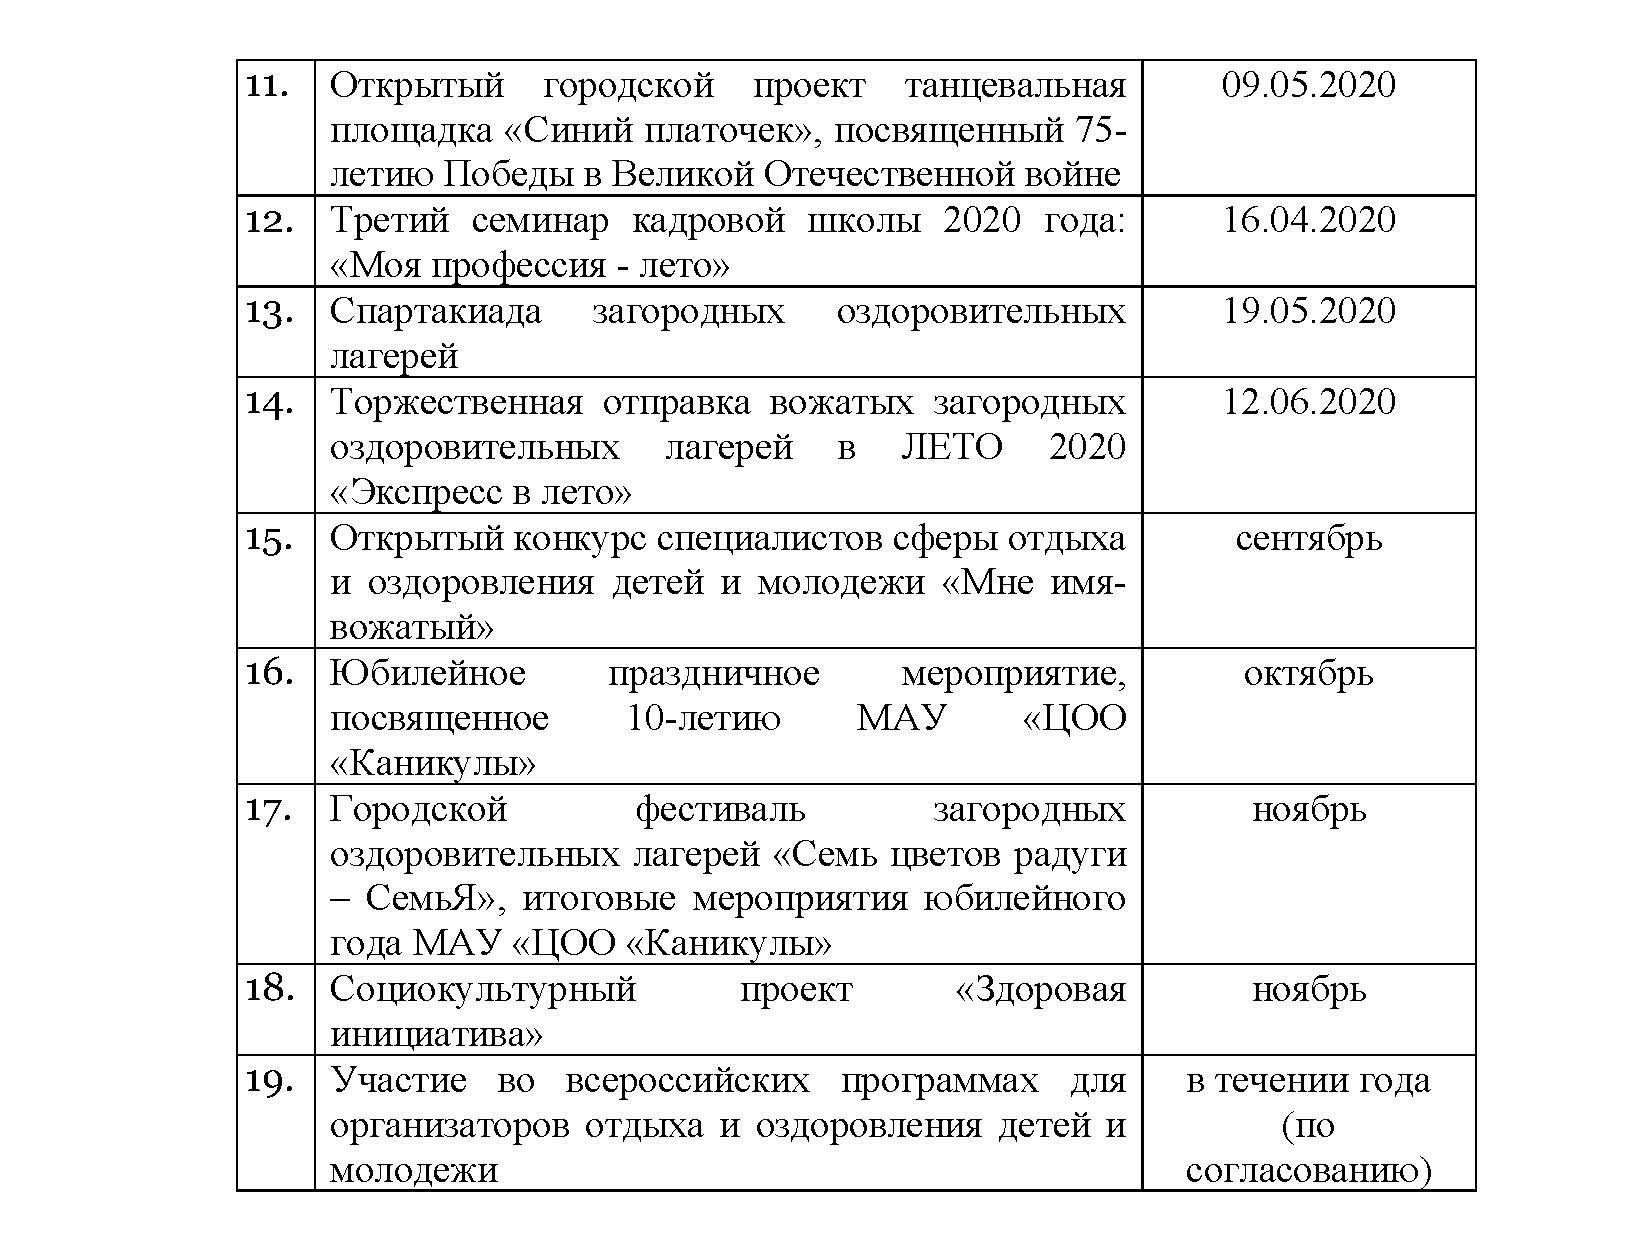 kalendar_sobytiy_MAU_TsOO_Kanikuly_2020_Страница_2